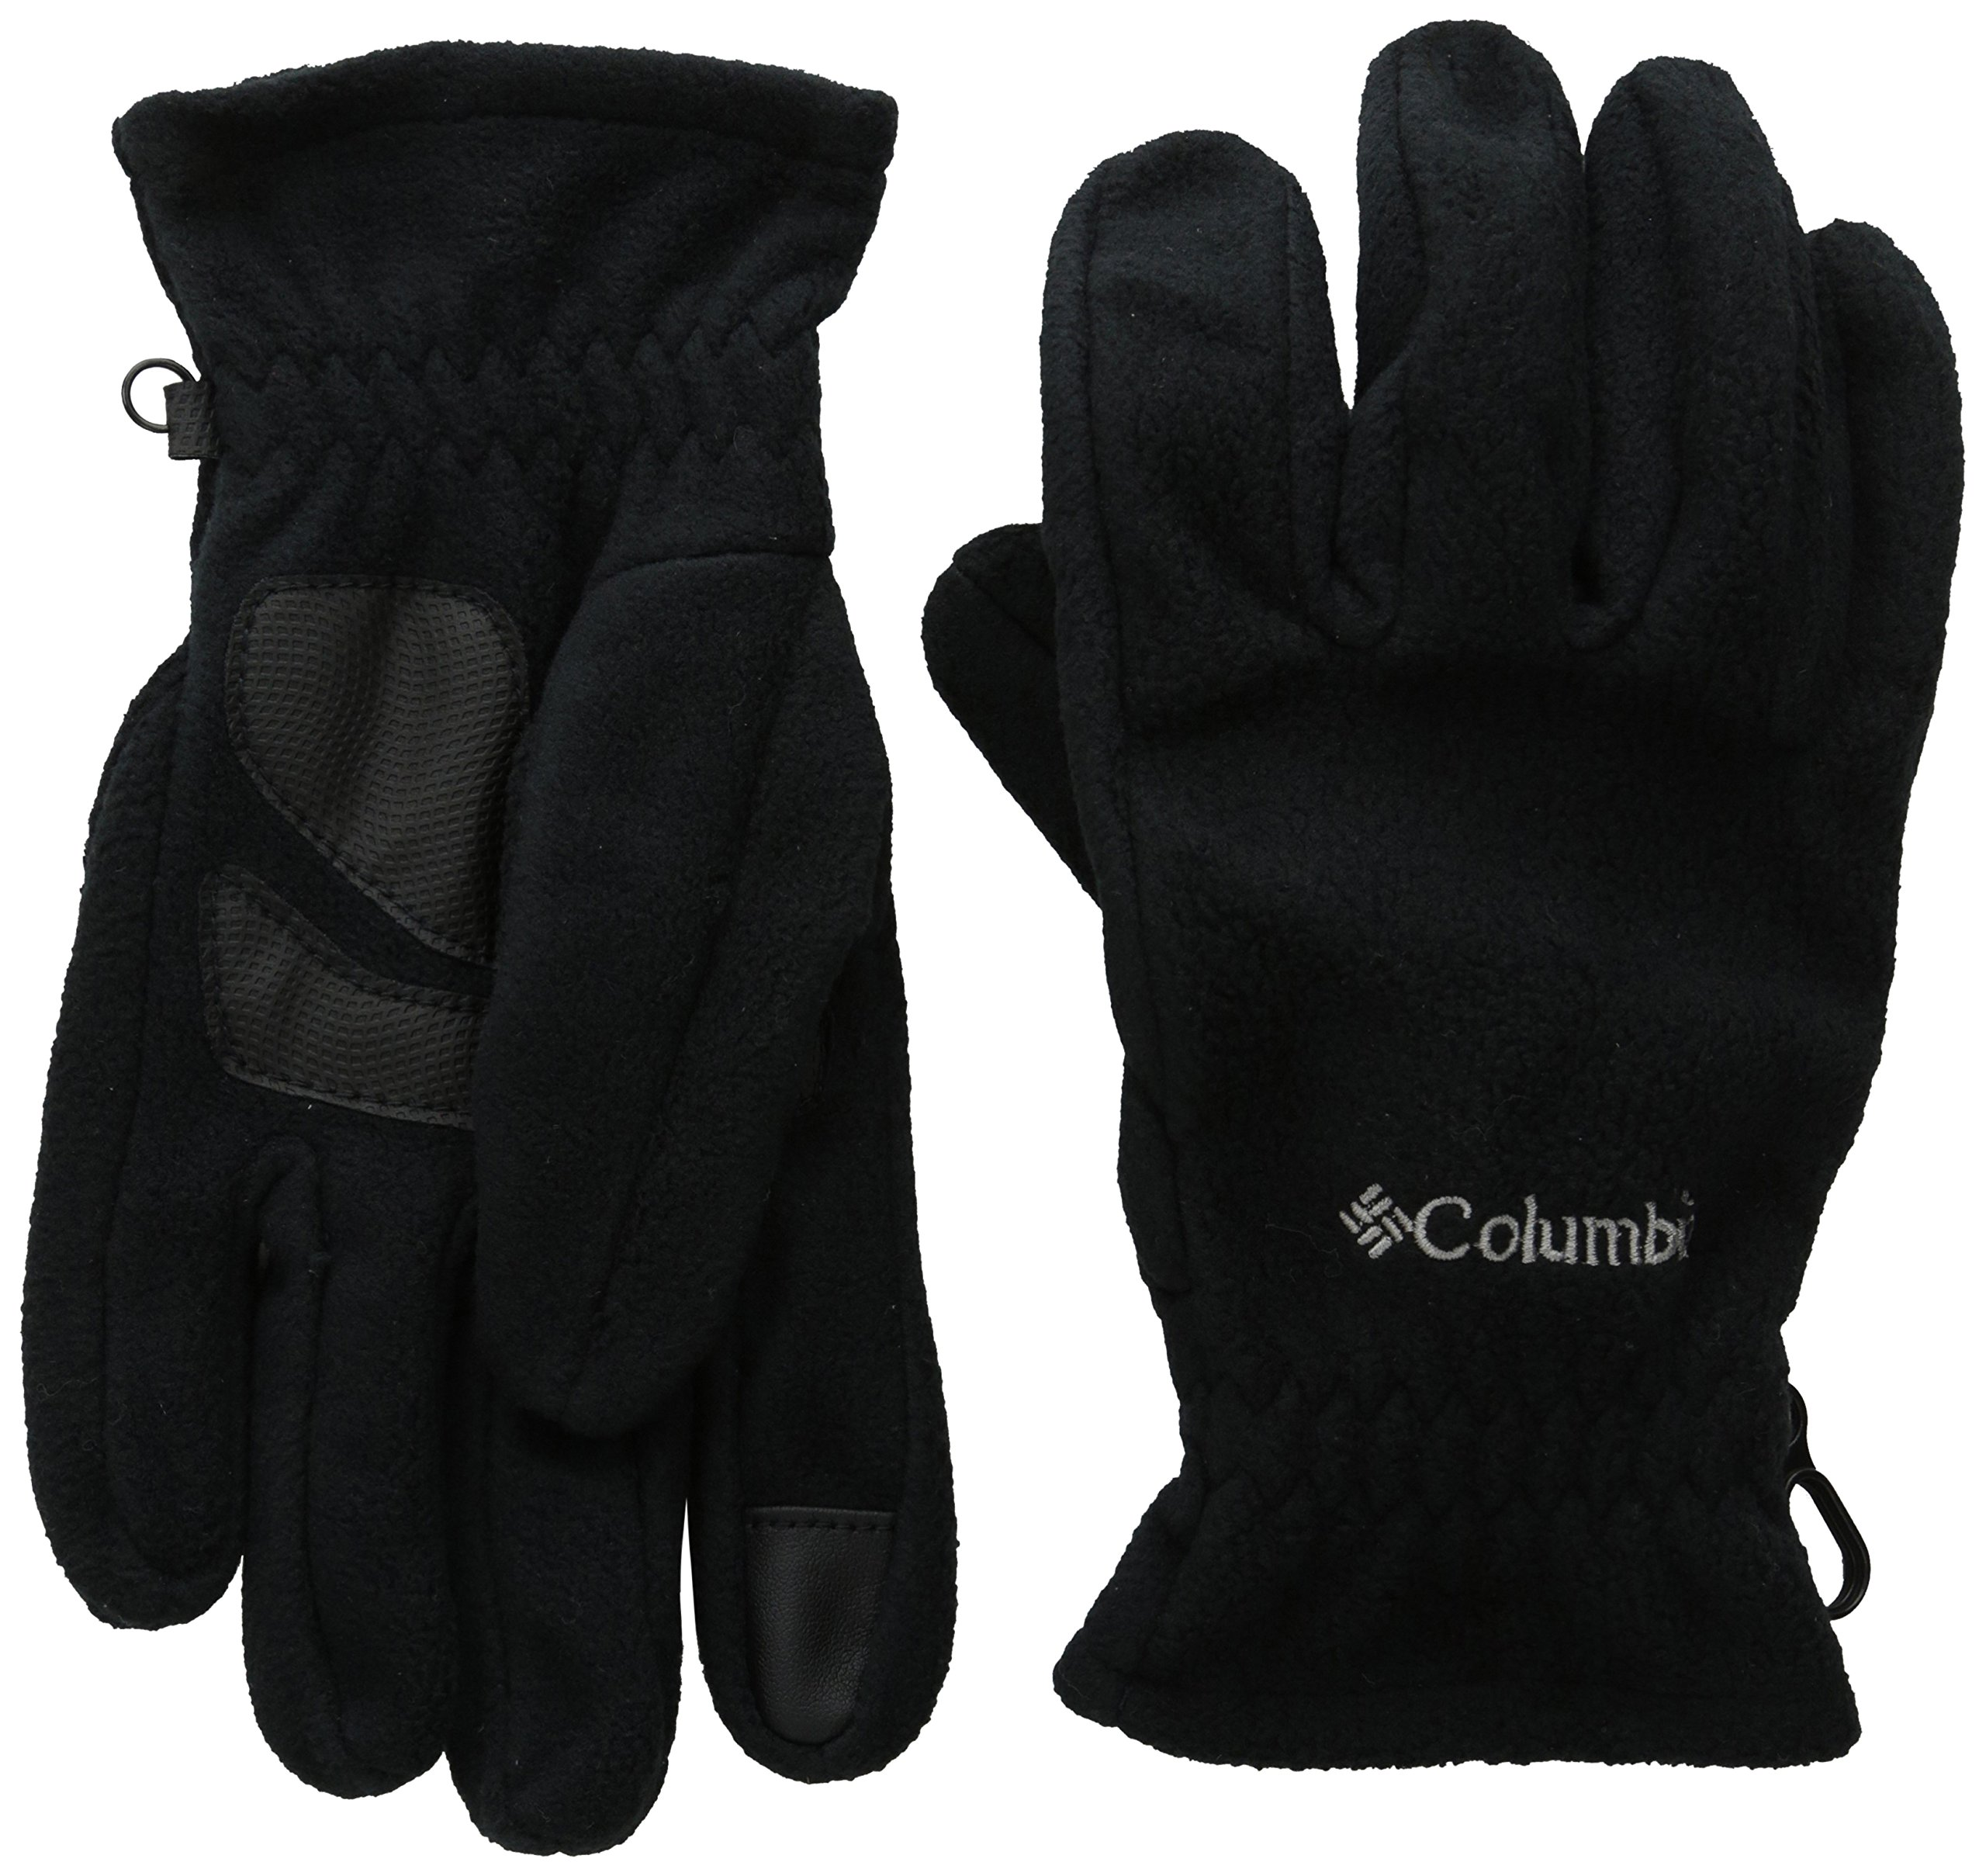 Columbia Women's Thermarator Gloves, Black, Medium by Columbia